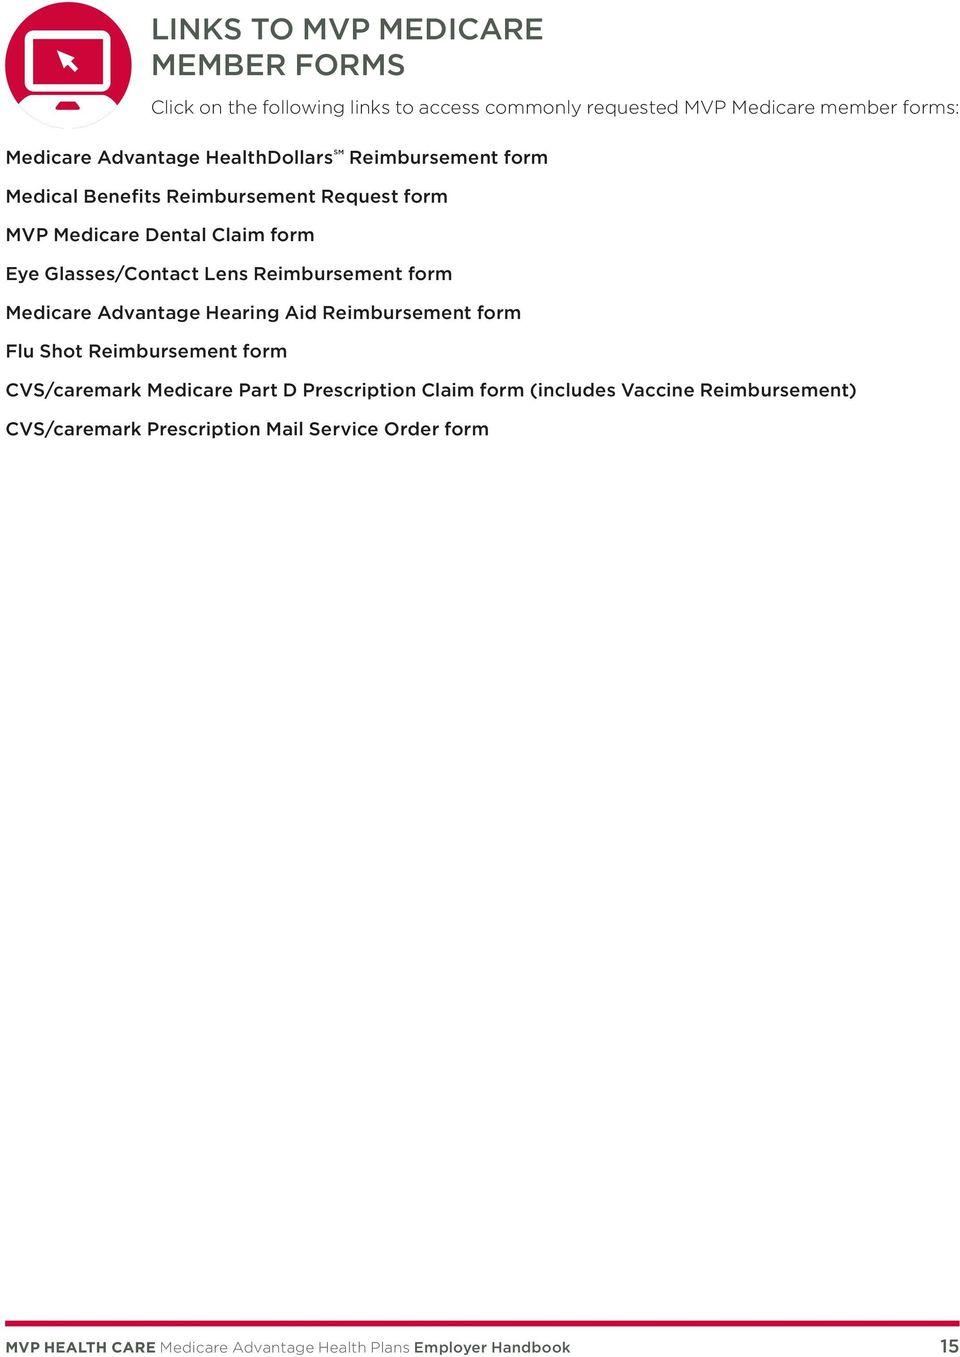 Reimbursement Form Medicare Advantage Hearing Aid Reimbursement Form Flu  Shot Reimbursement Form Cvs/caremark Medicare